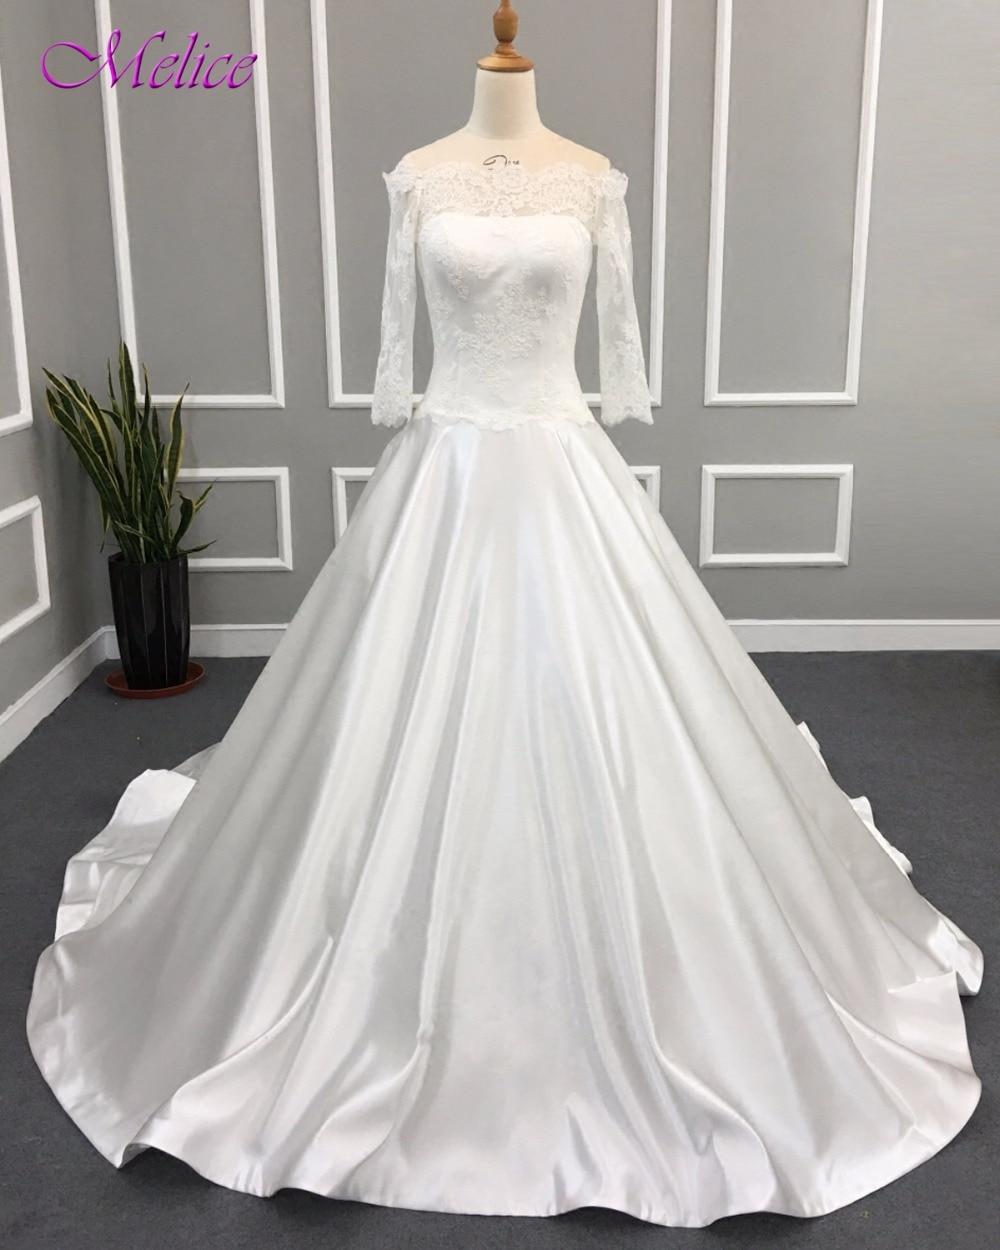 Romantic Wedding Dresses 2019: Melice Romantic Boat Neck Zipper Up Vintage Satin Wedding